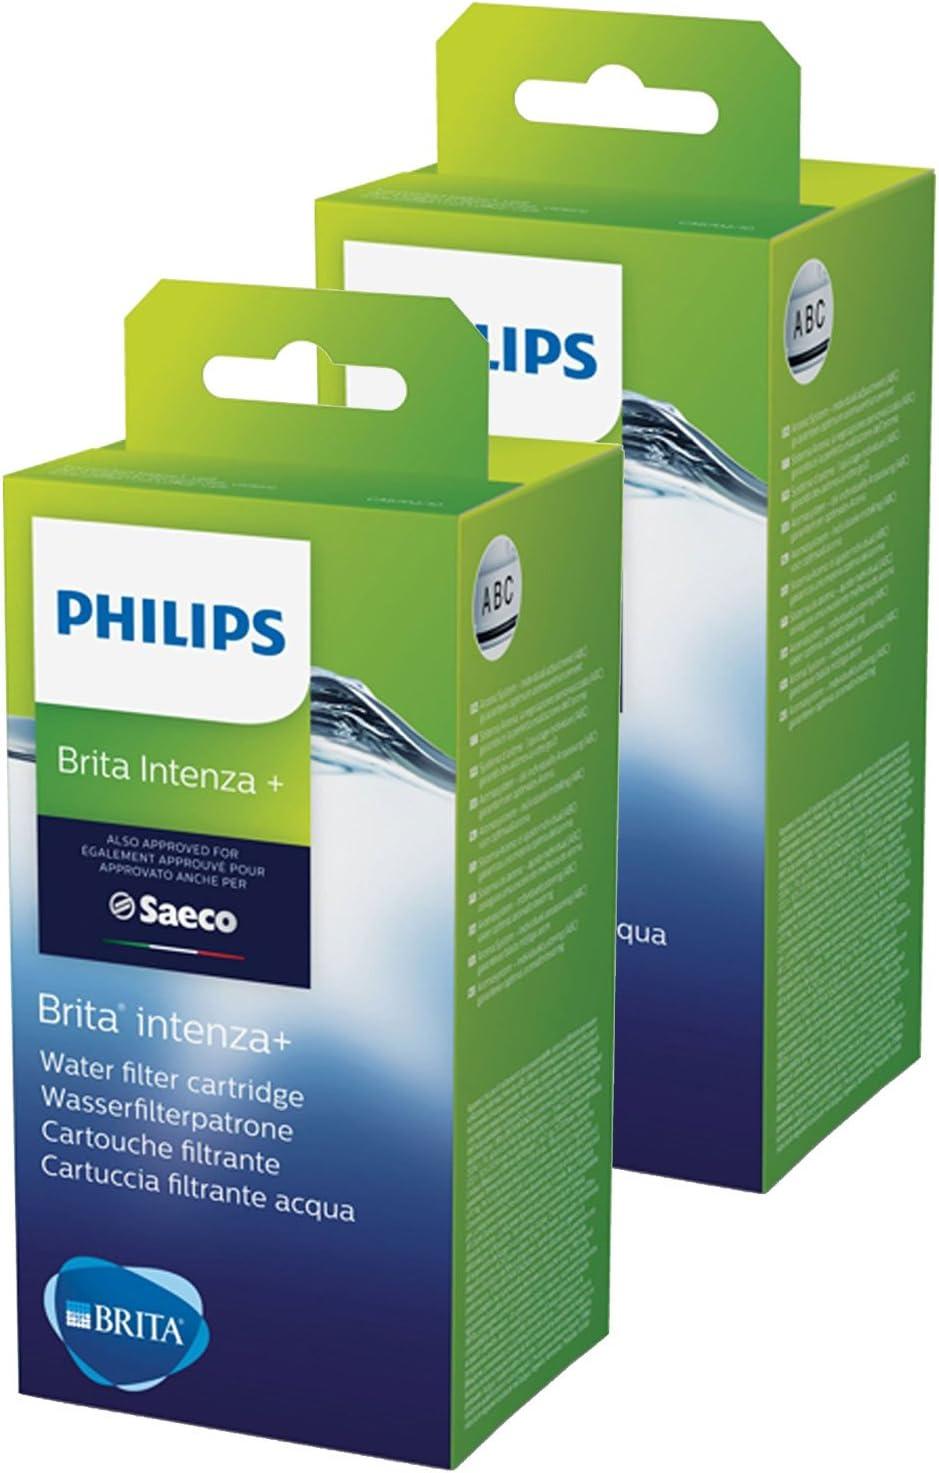 Philips Saeco CA6702//00 Brita Intenza Water Filter Pack of 1